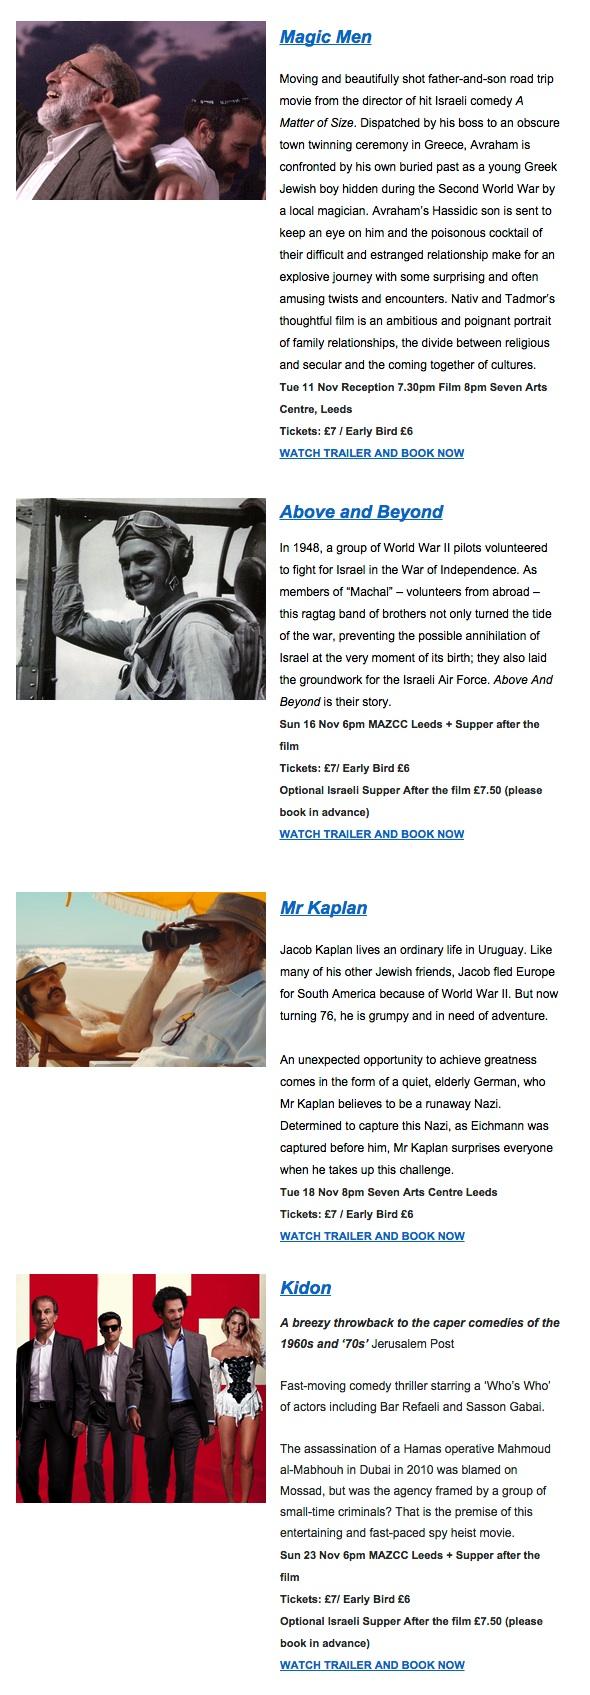 film festival descriptions.